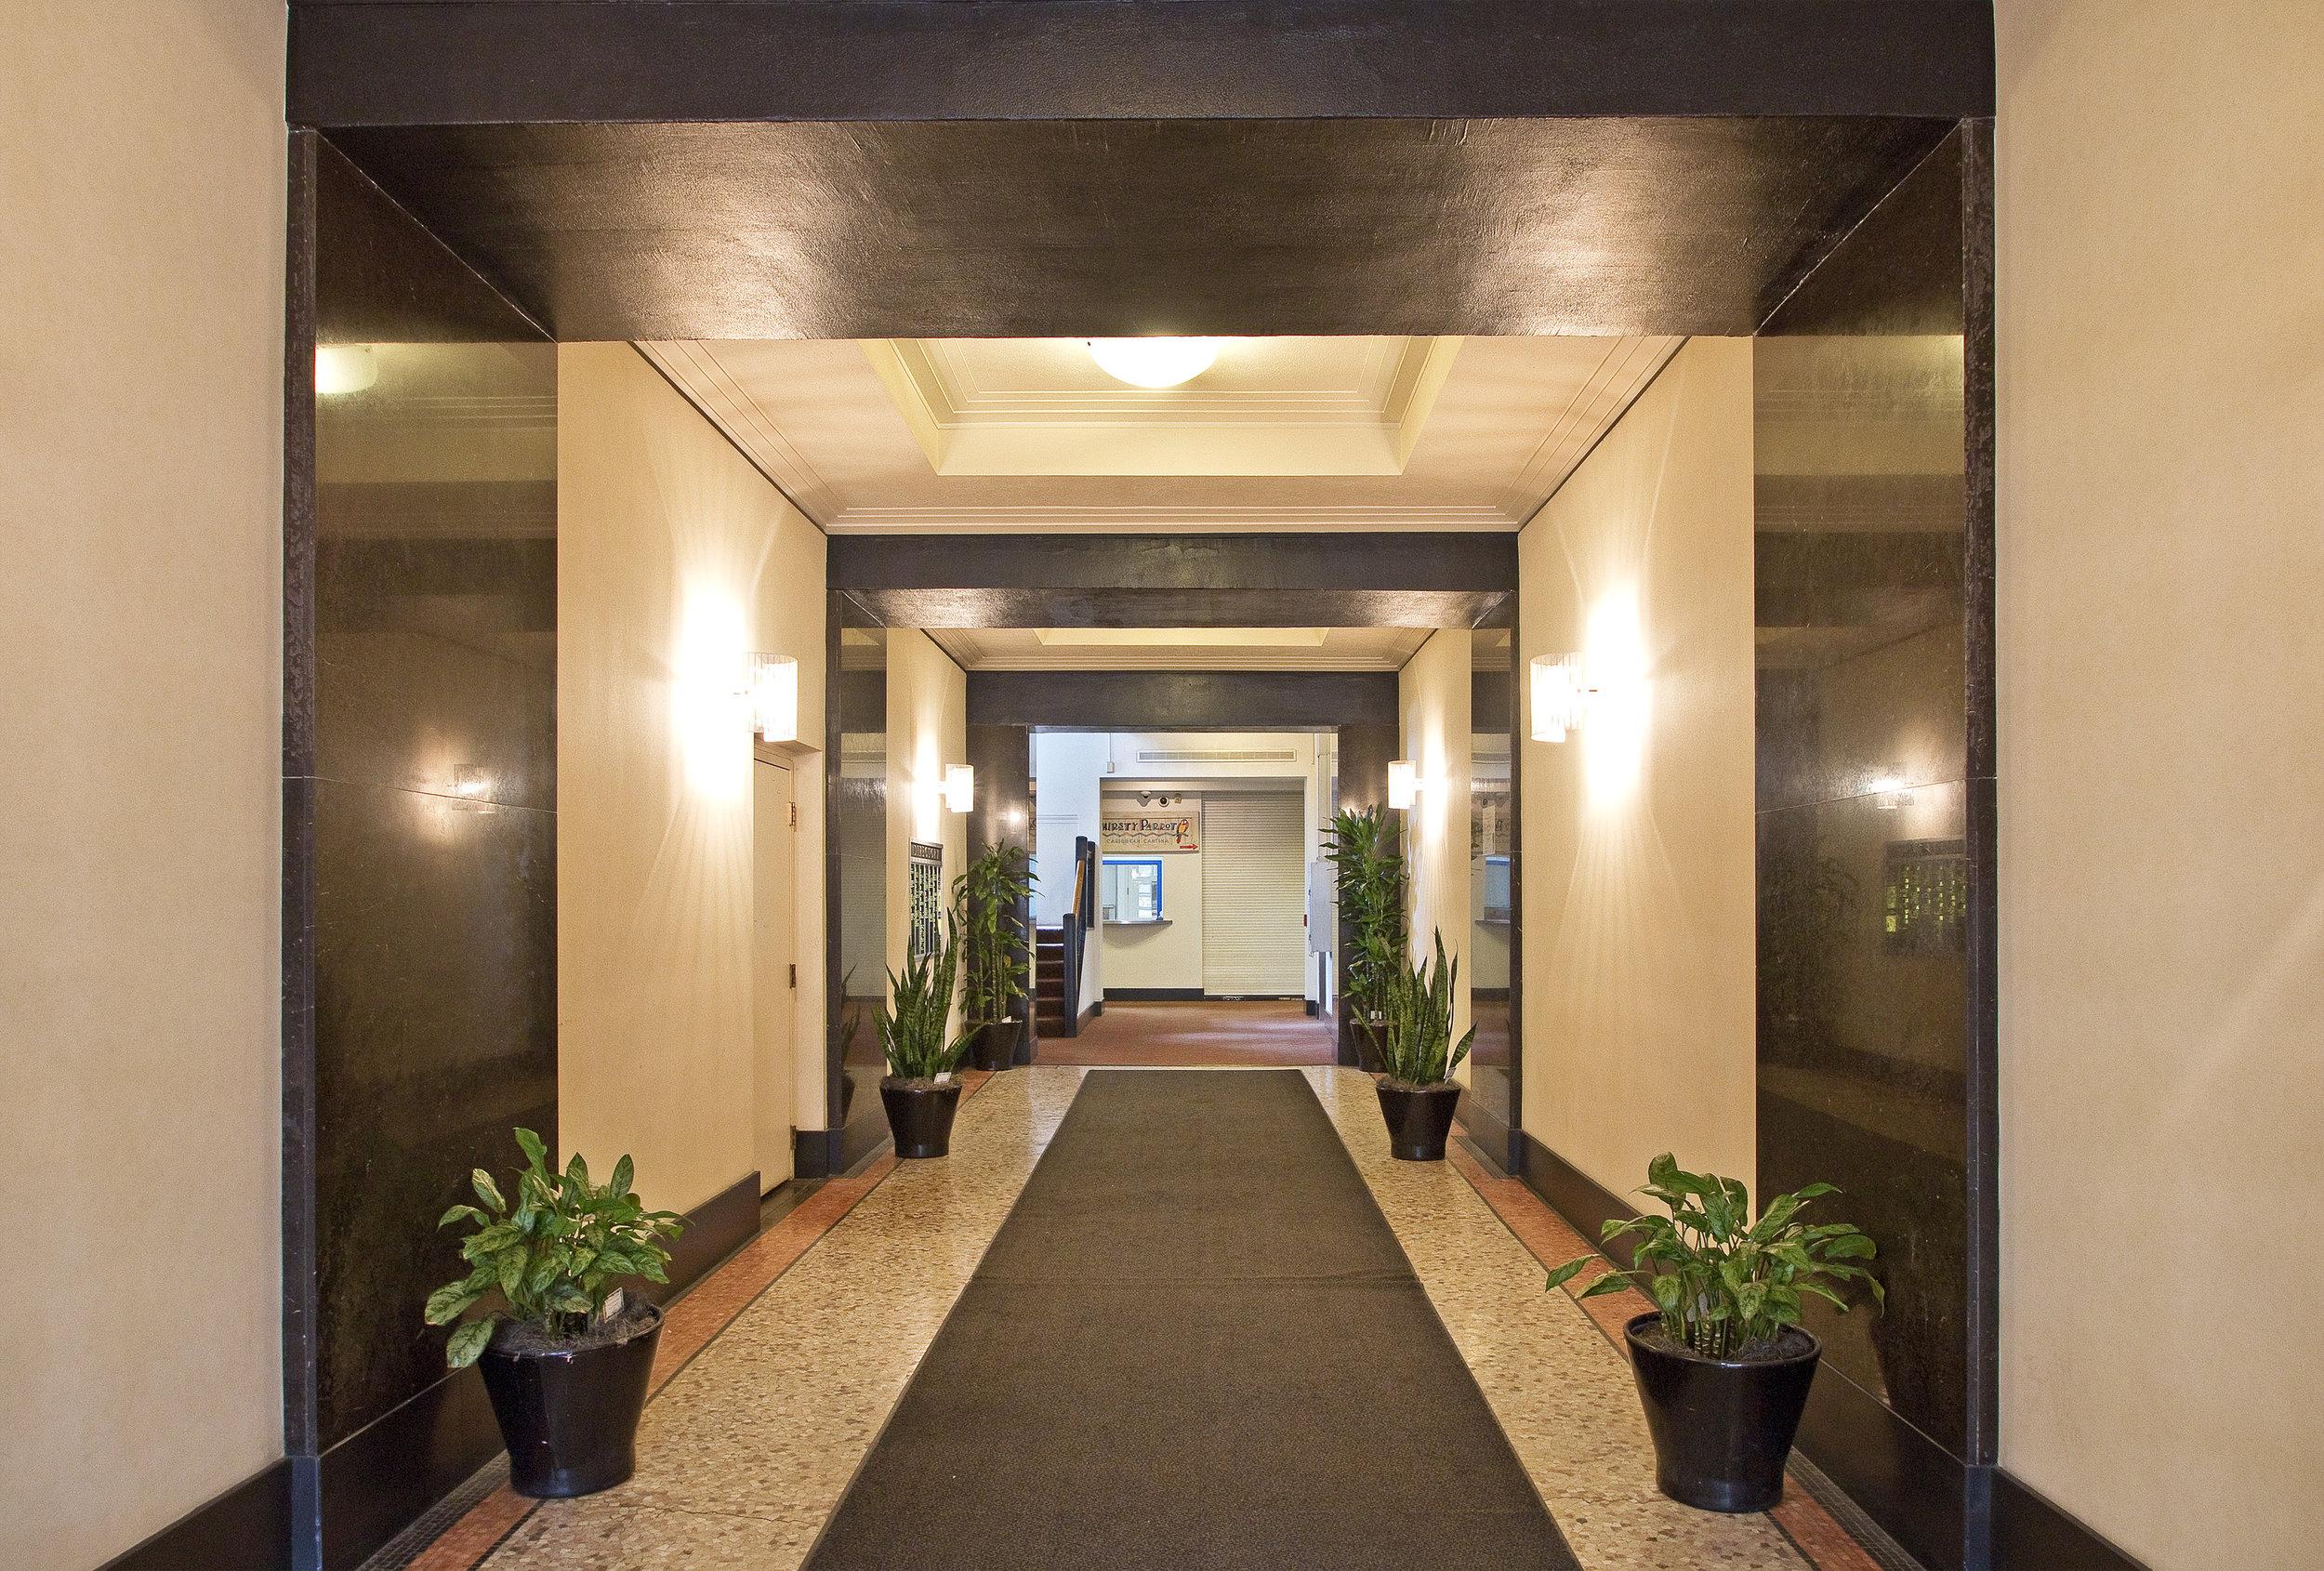 caxton building front entrance hallway